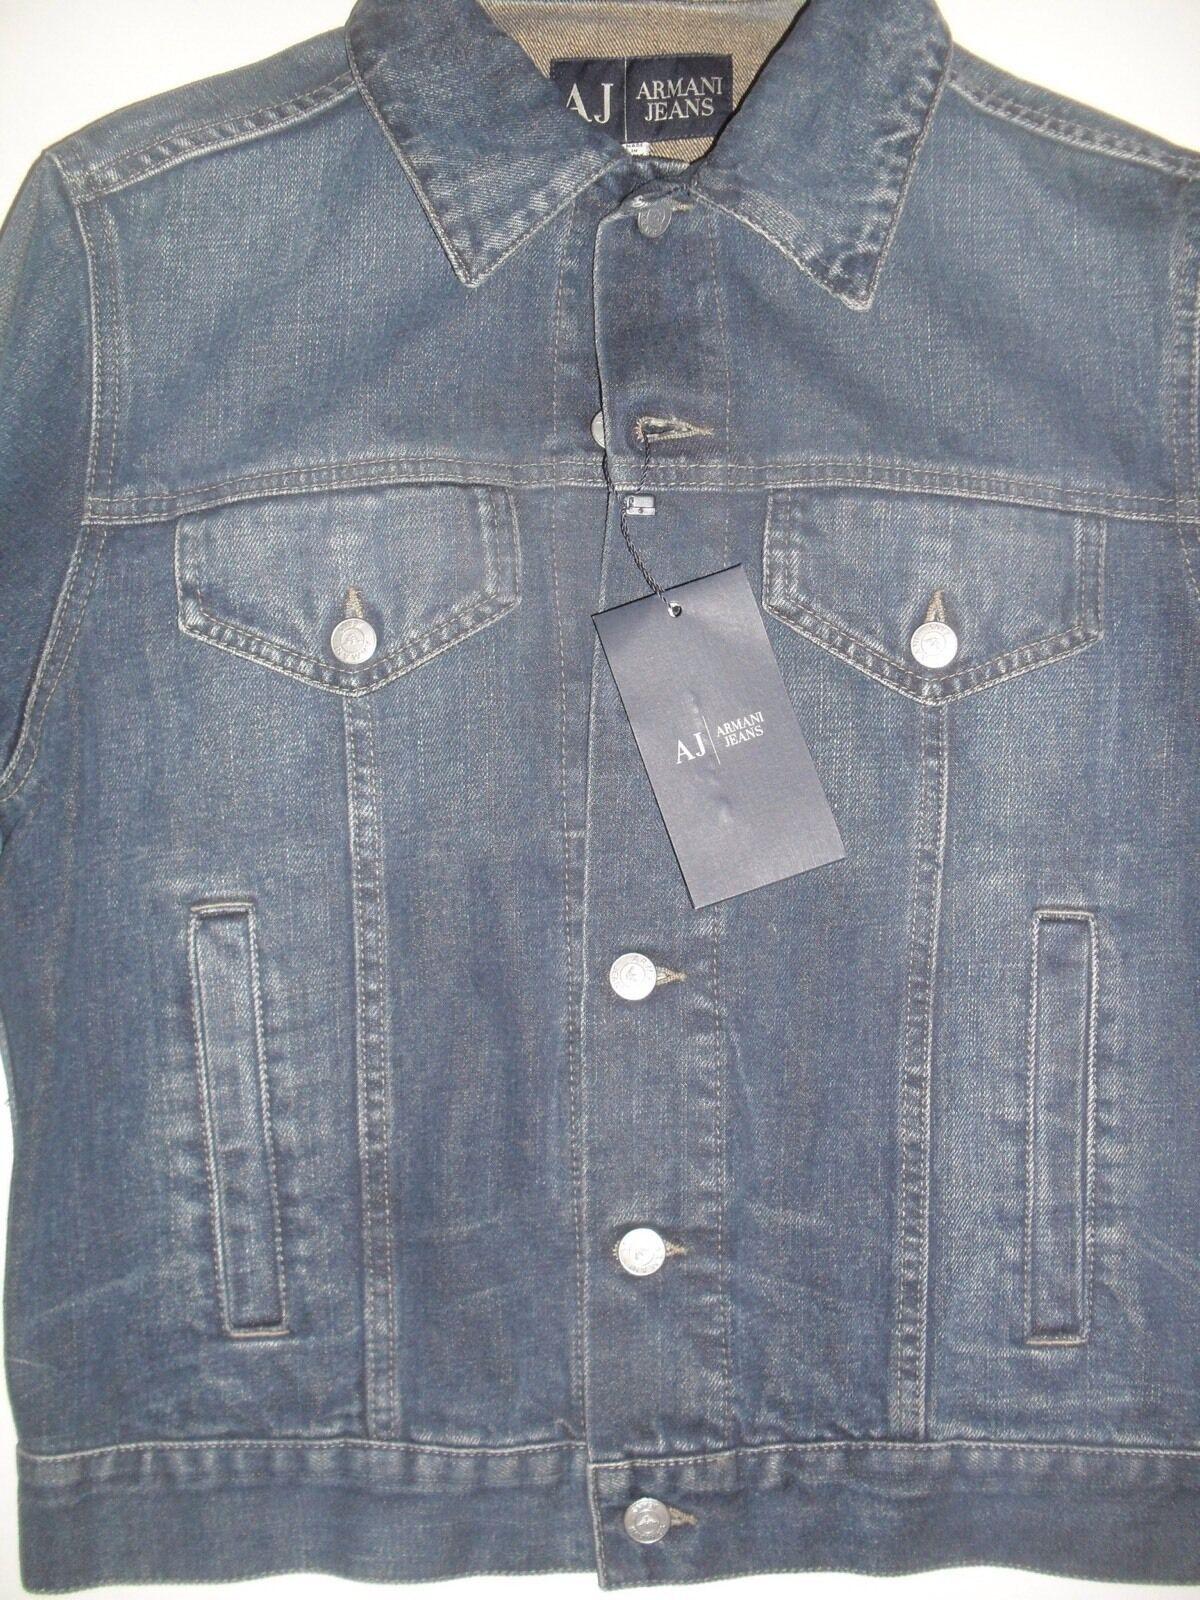 Armani Jeans Jacket Größe Medium